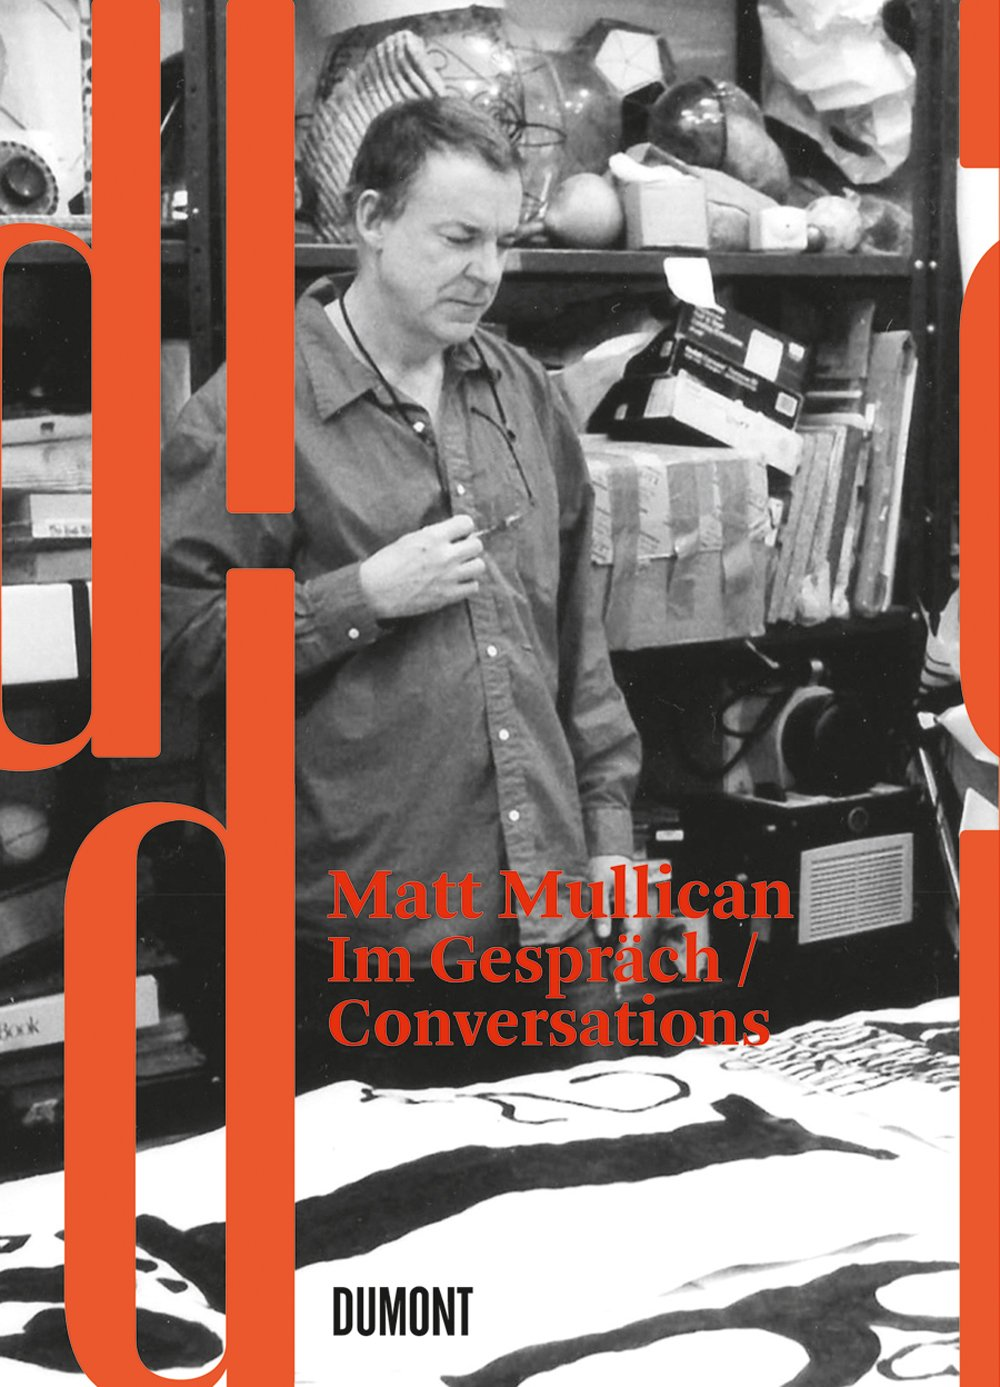 Matt Mullican: Conversations (Dumont Dokumente) PDF